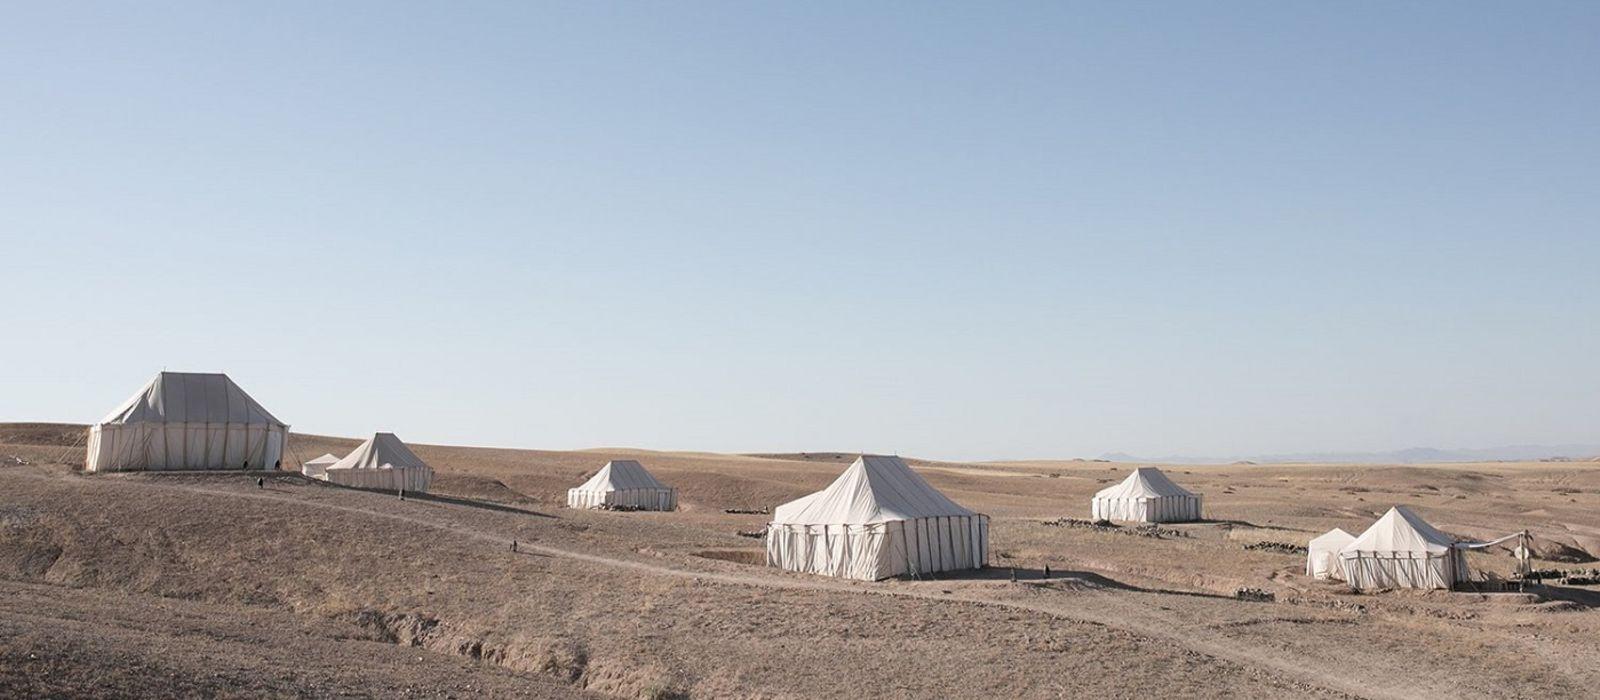 Hotel Inara Camp, Agafay Morocco